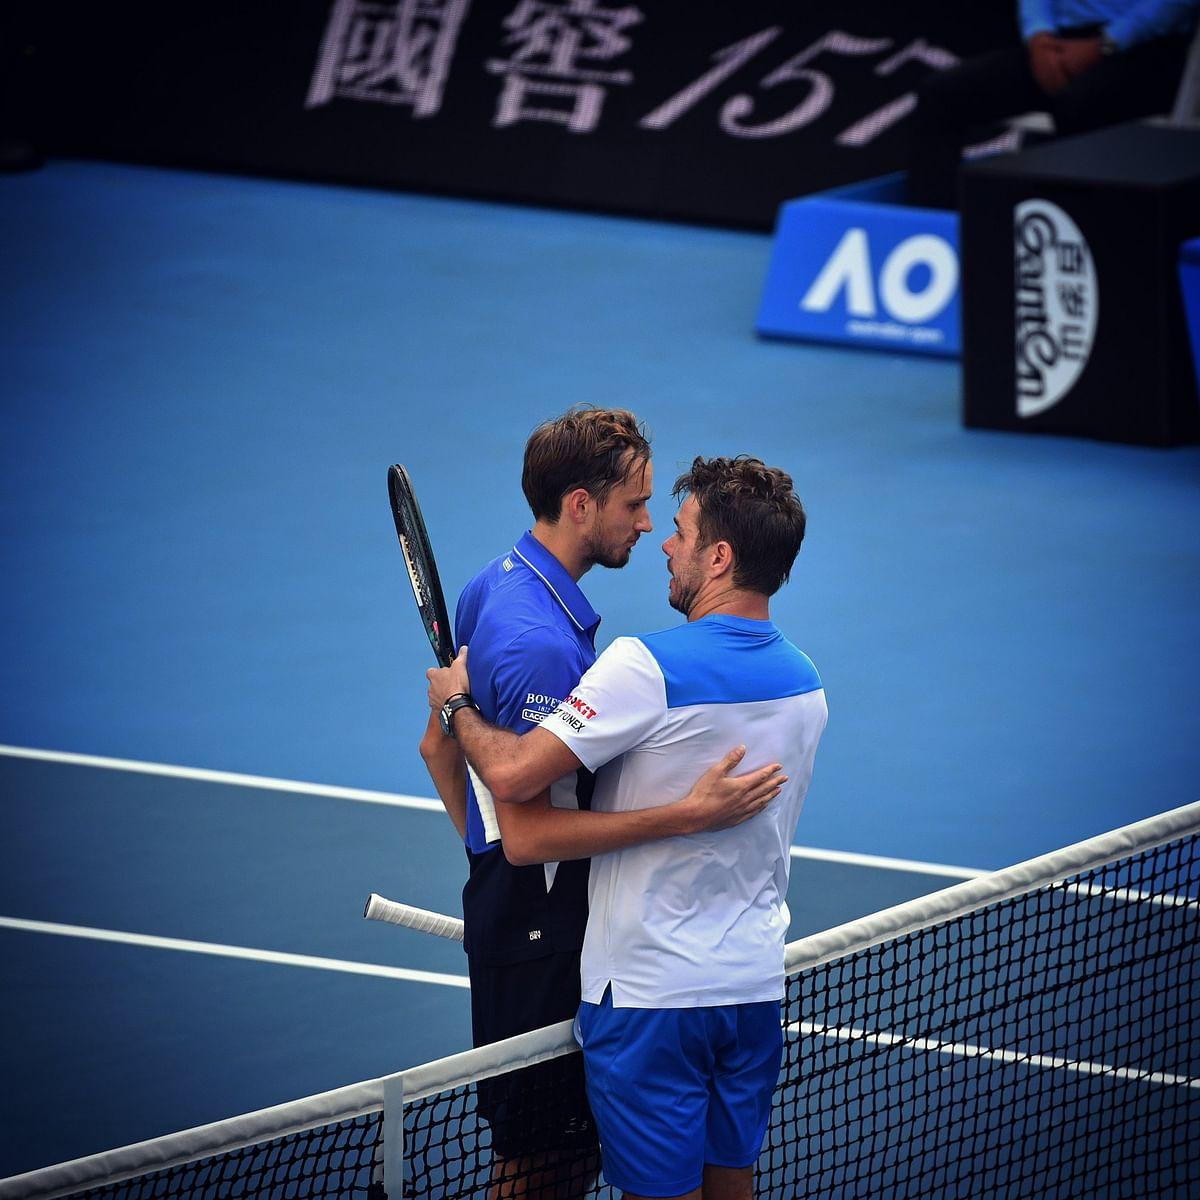 Australian Open: Vintage Wawrinka tricks Medvedev to reach quarters